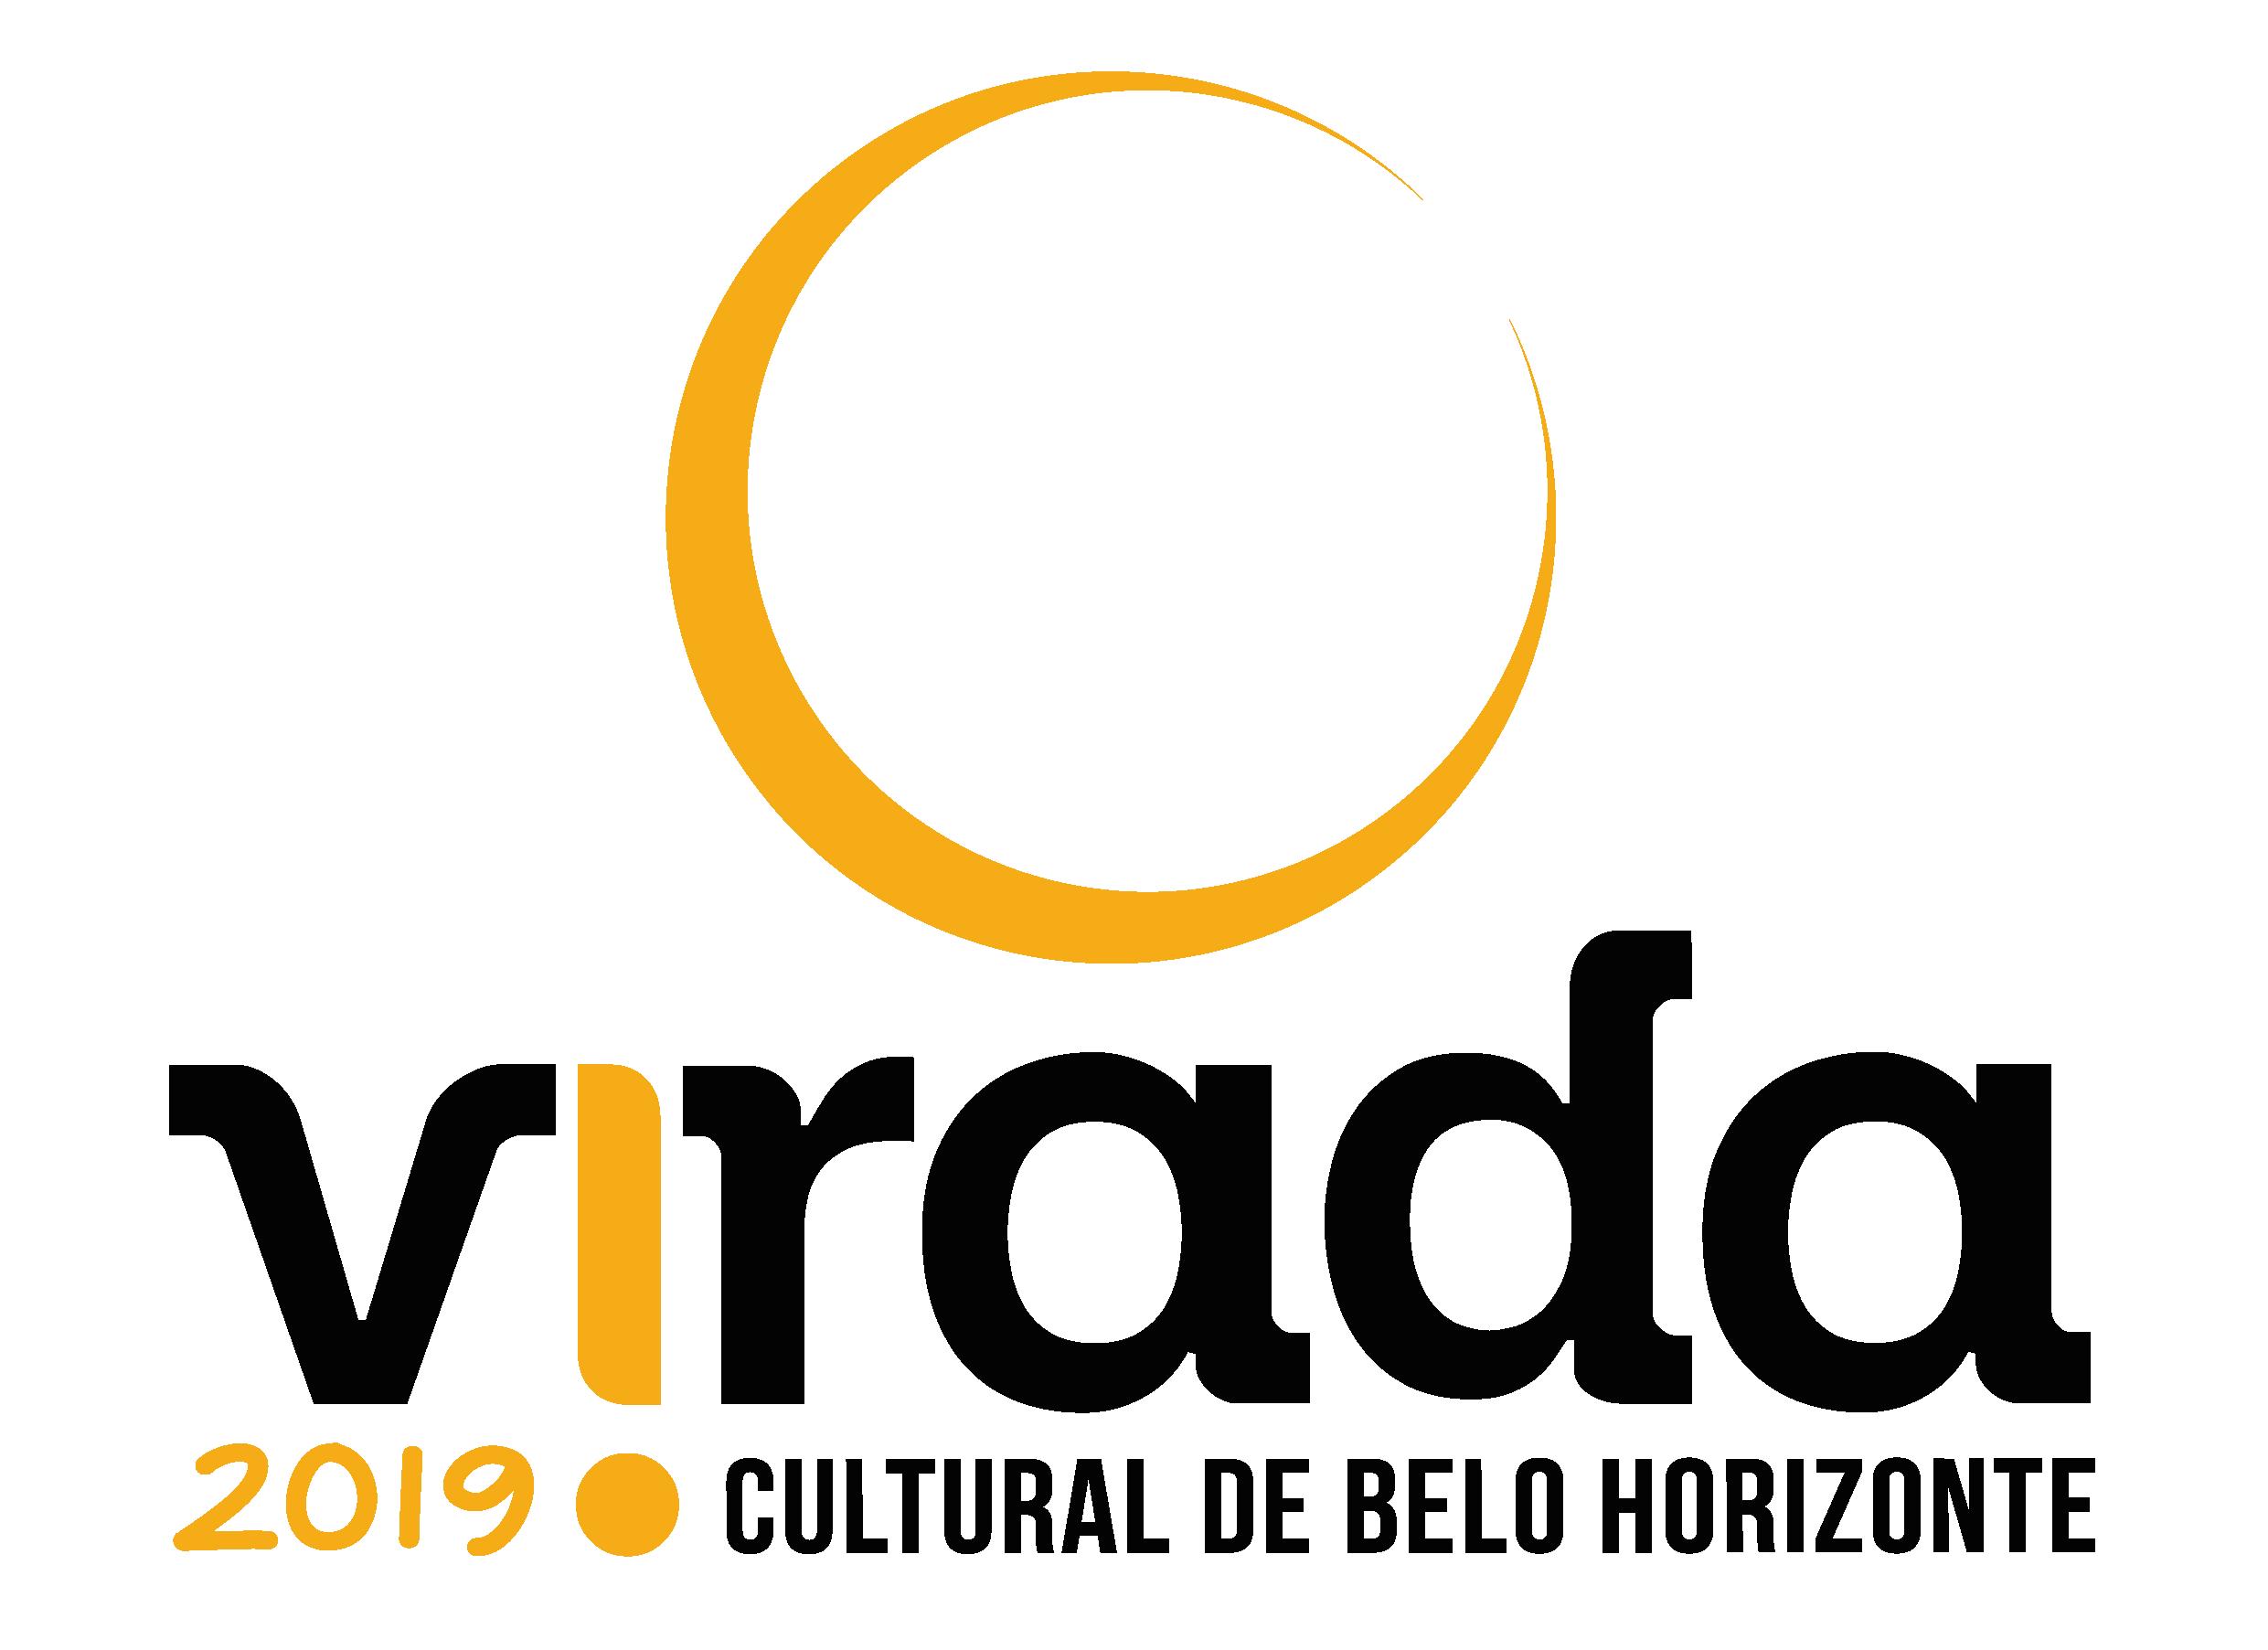 logo da virada cultural de BH 2019